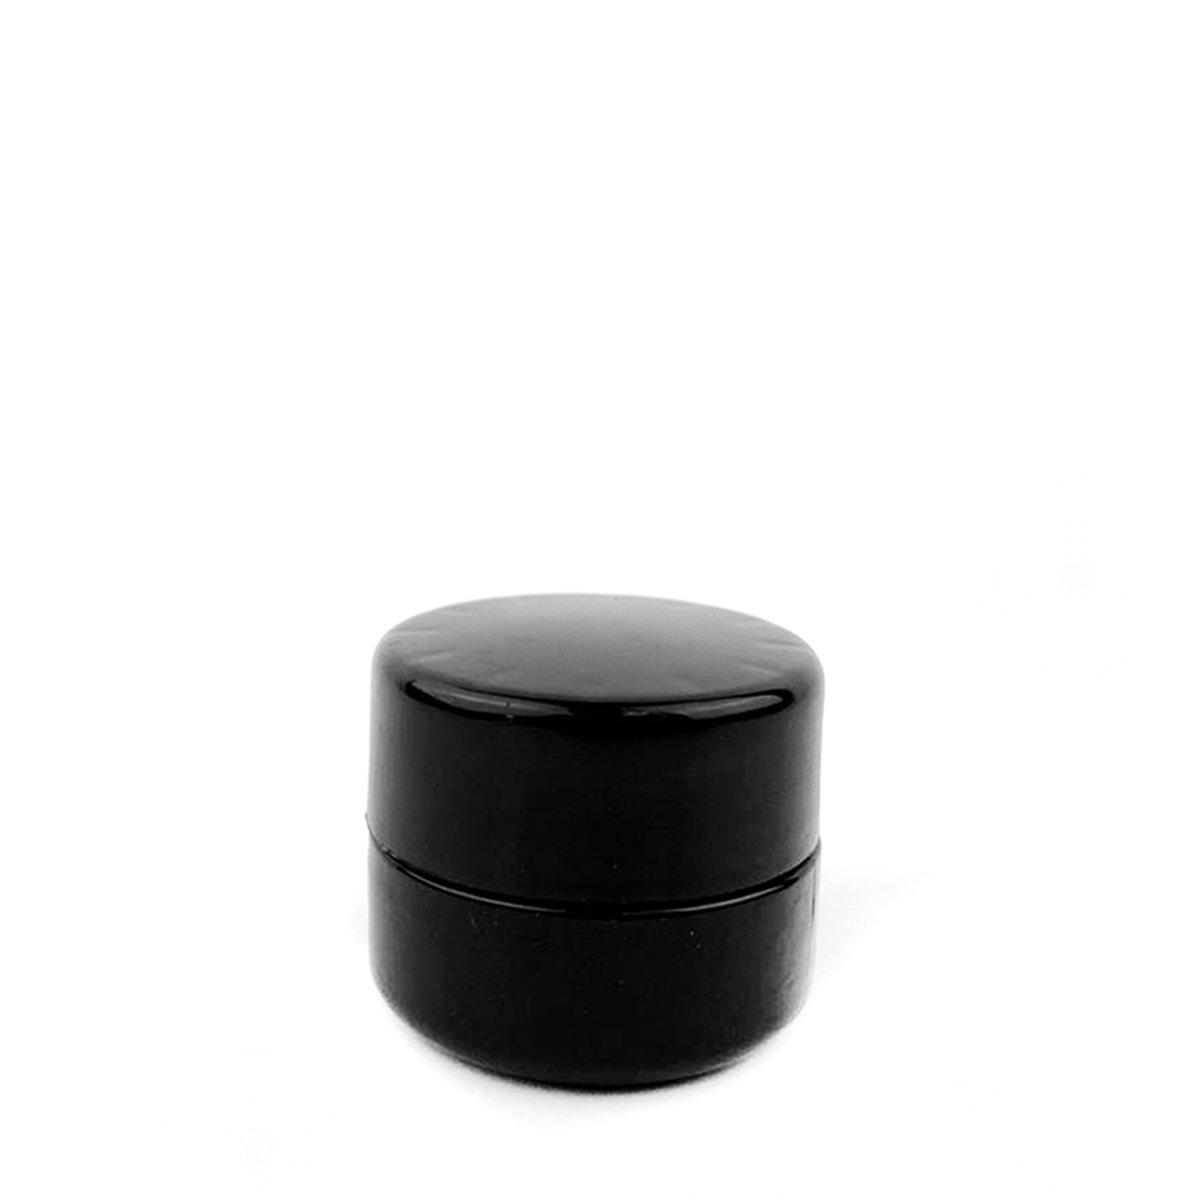 5mL Black UV Glass Child Resistant Jar Container